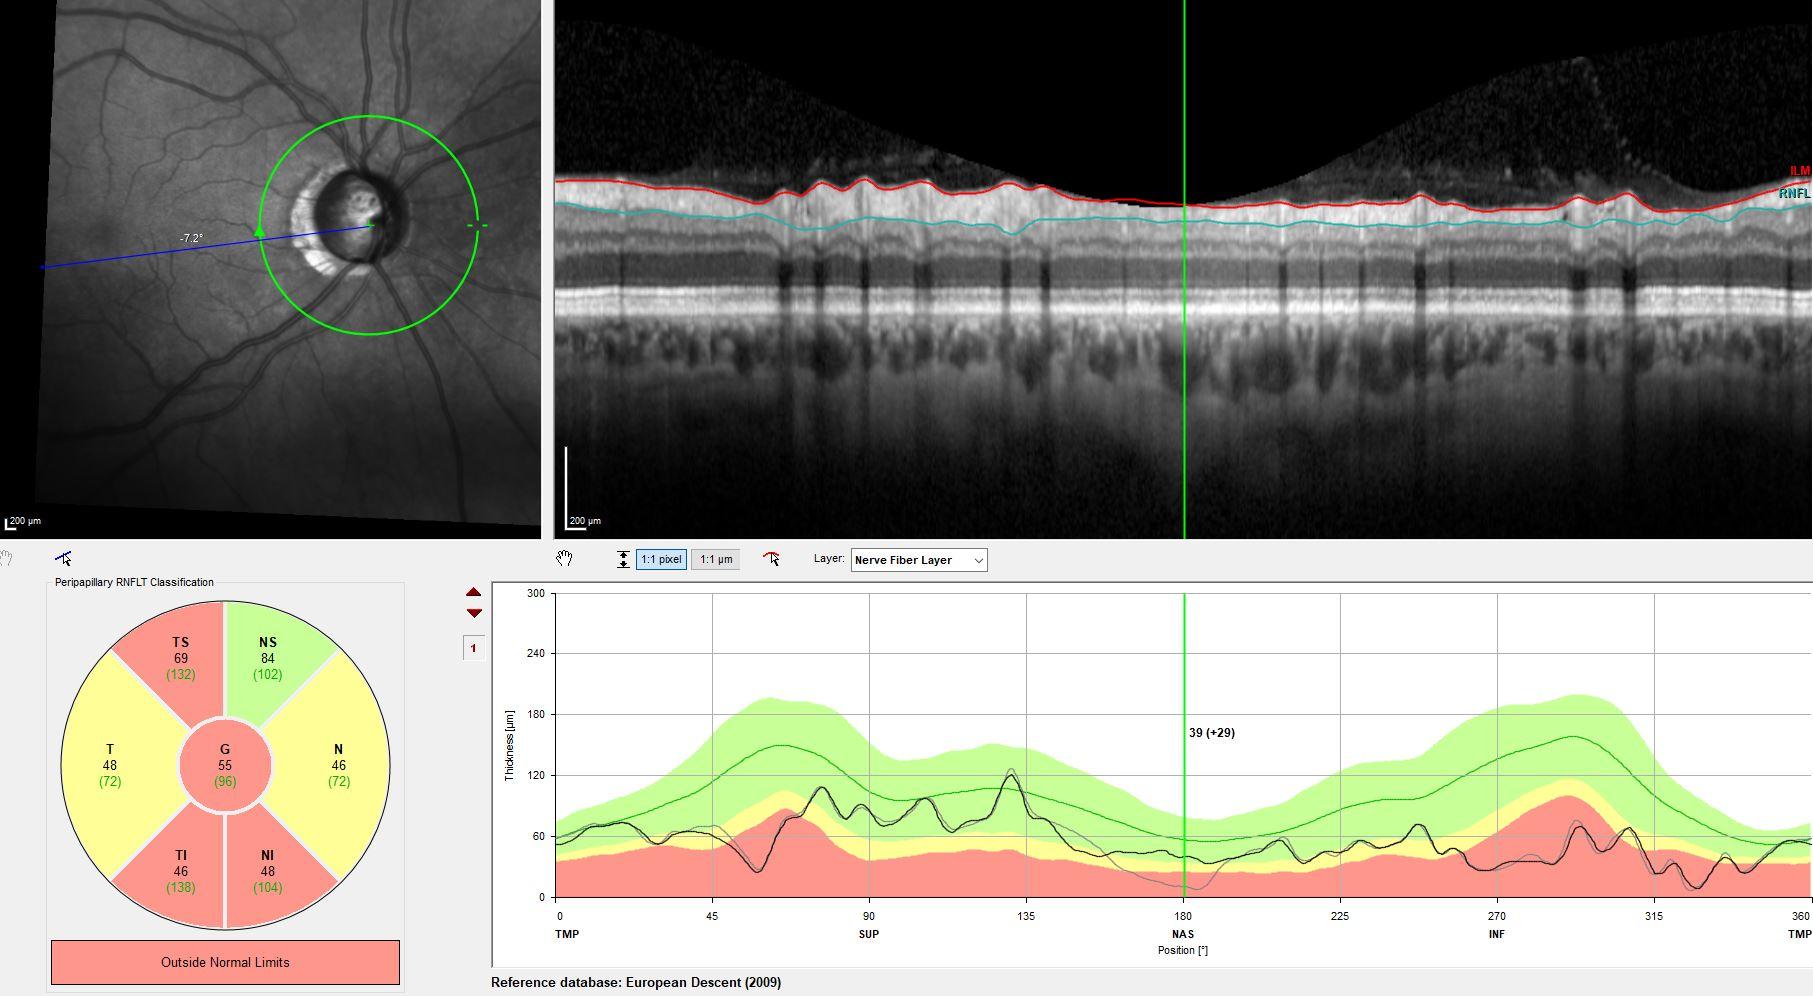 Augenklinik Castrop-Rauxel Grüner Star